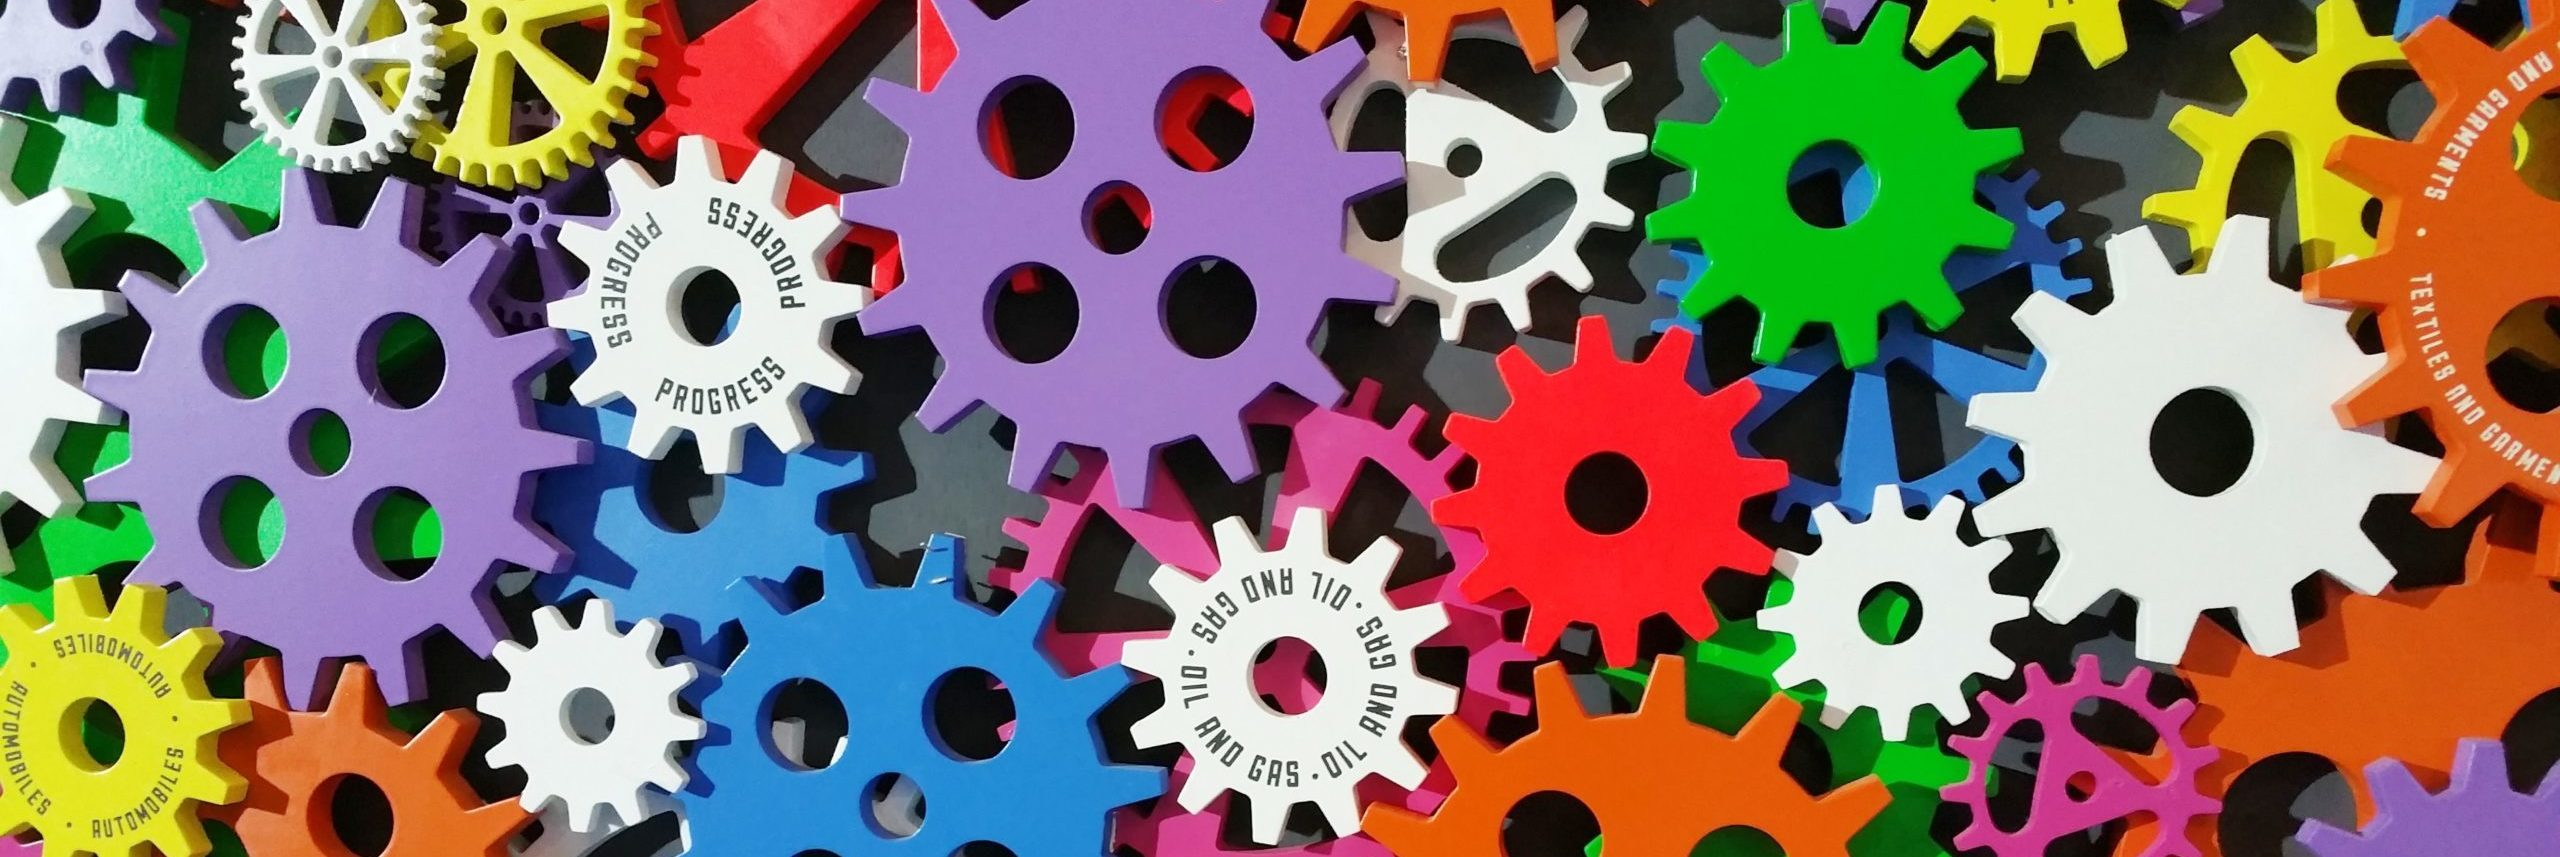 Hidden Opportunities in a Culture of Constant Change